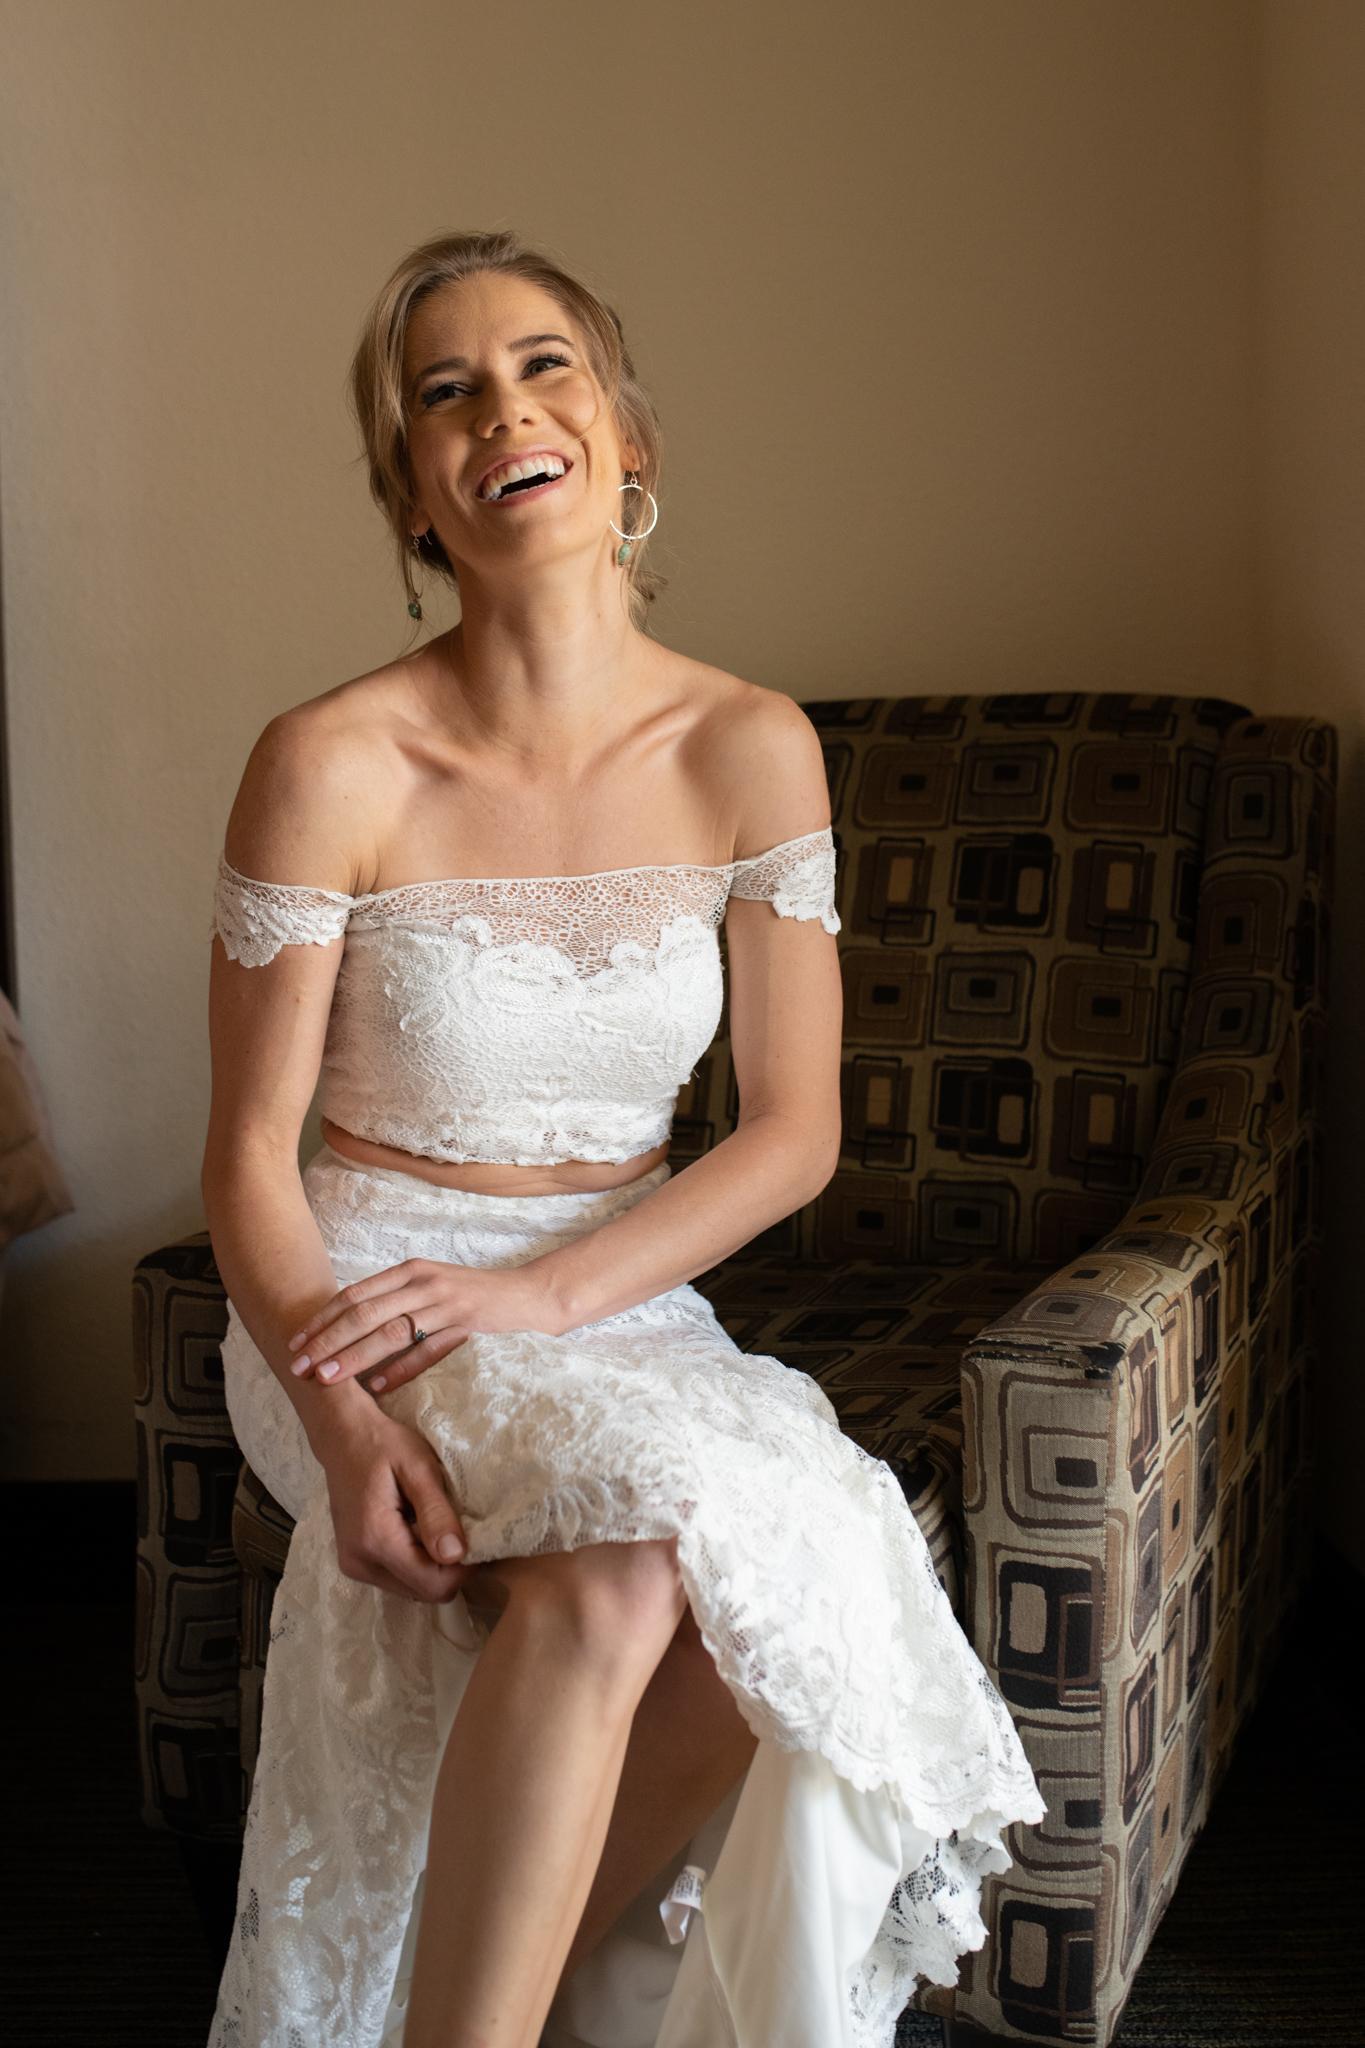 02_PRVW_Jenny_Ken_Wedding_Trevor_Hooper_Photo.jpg